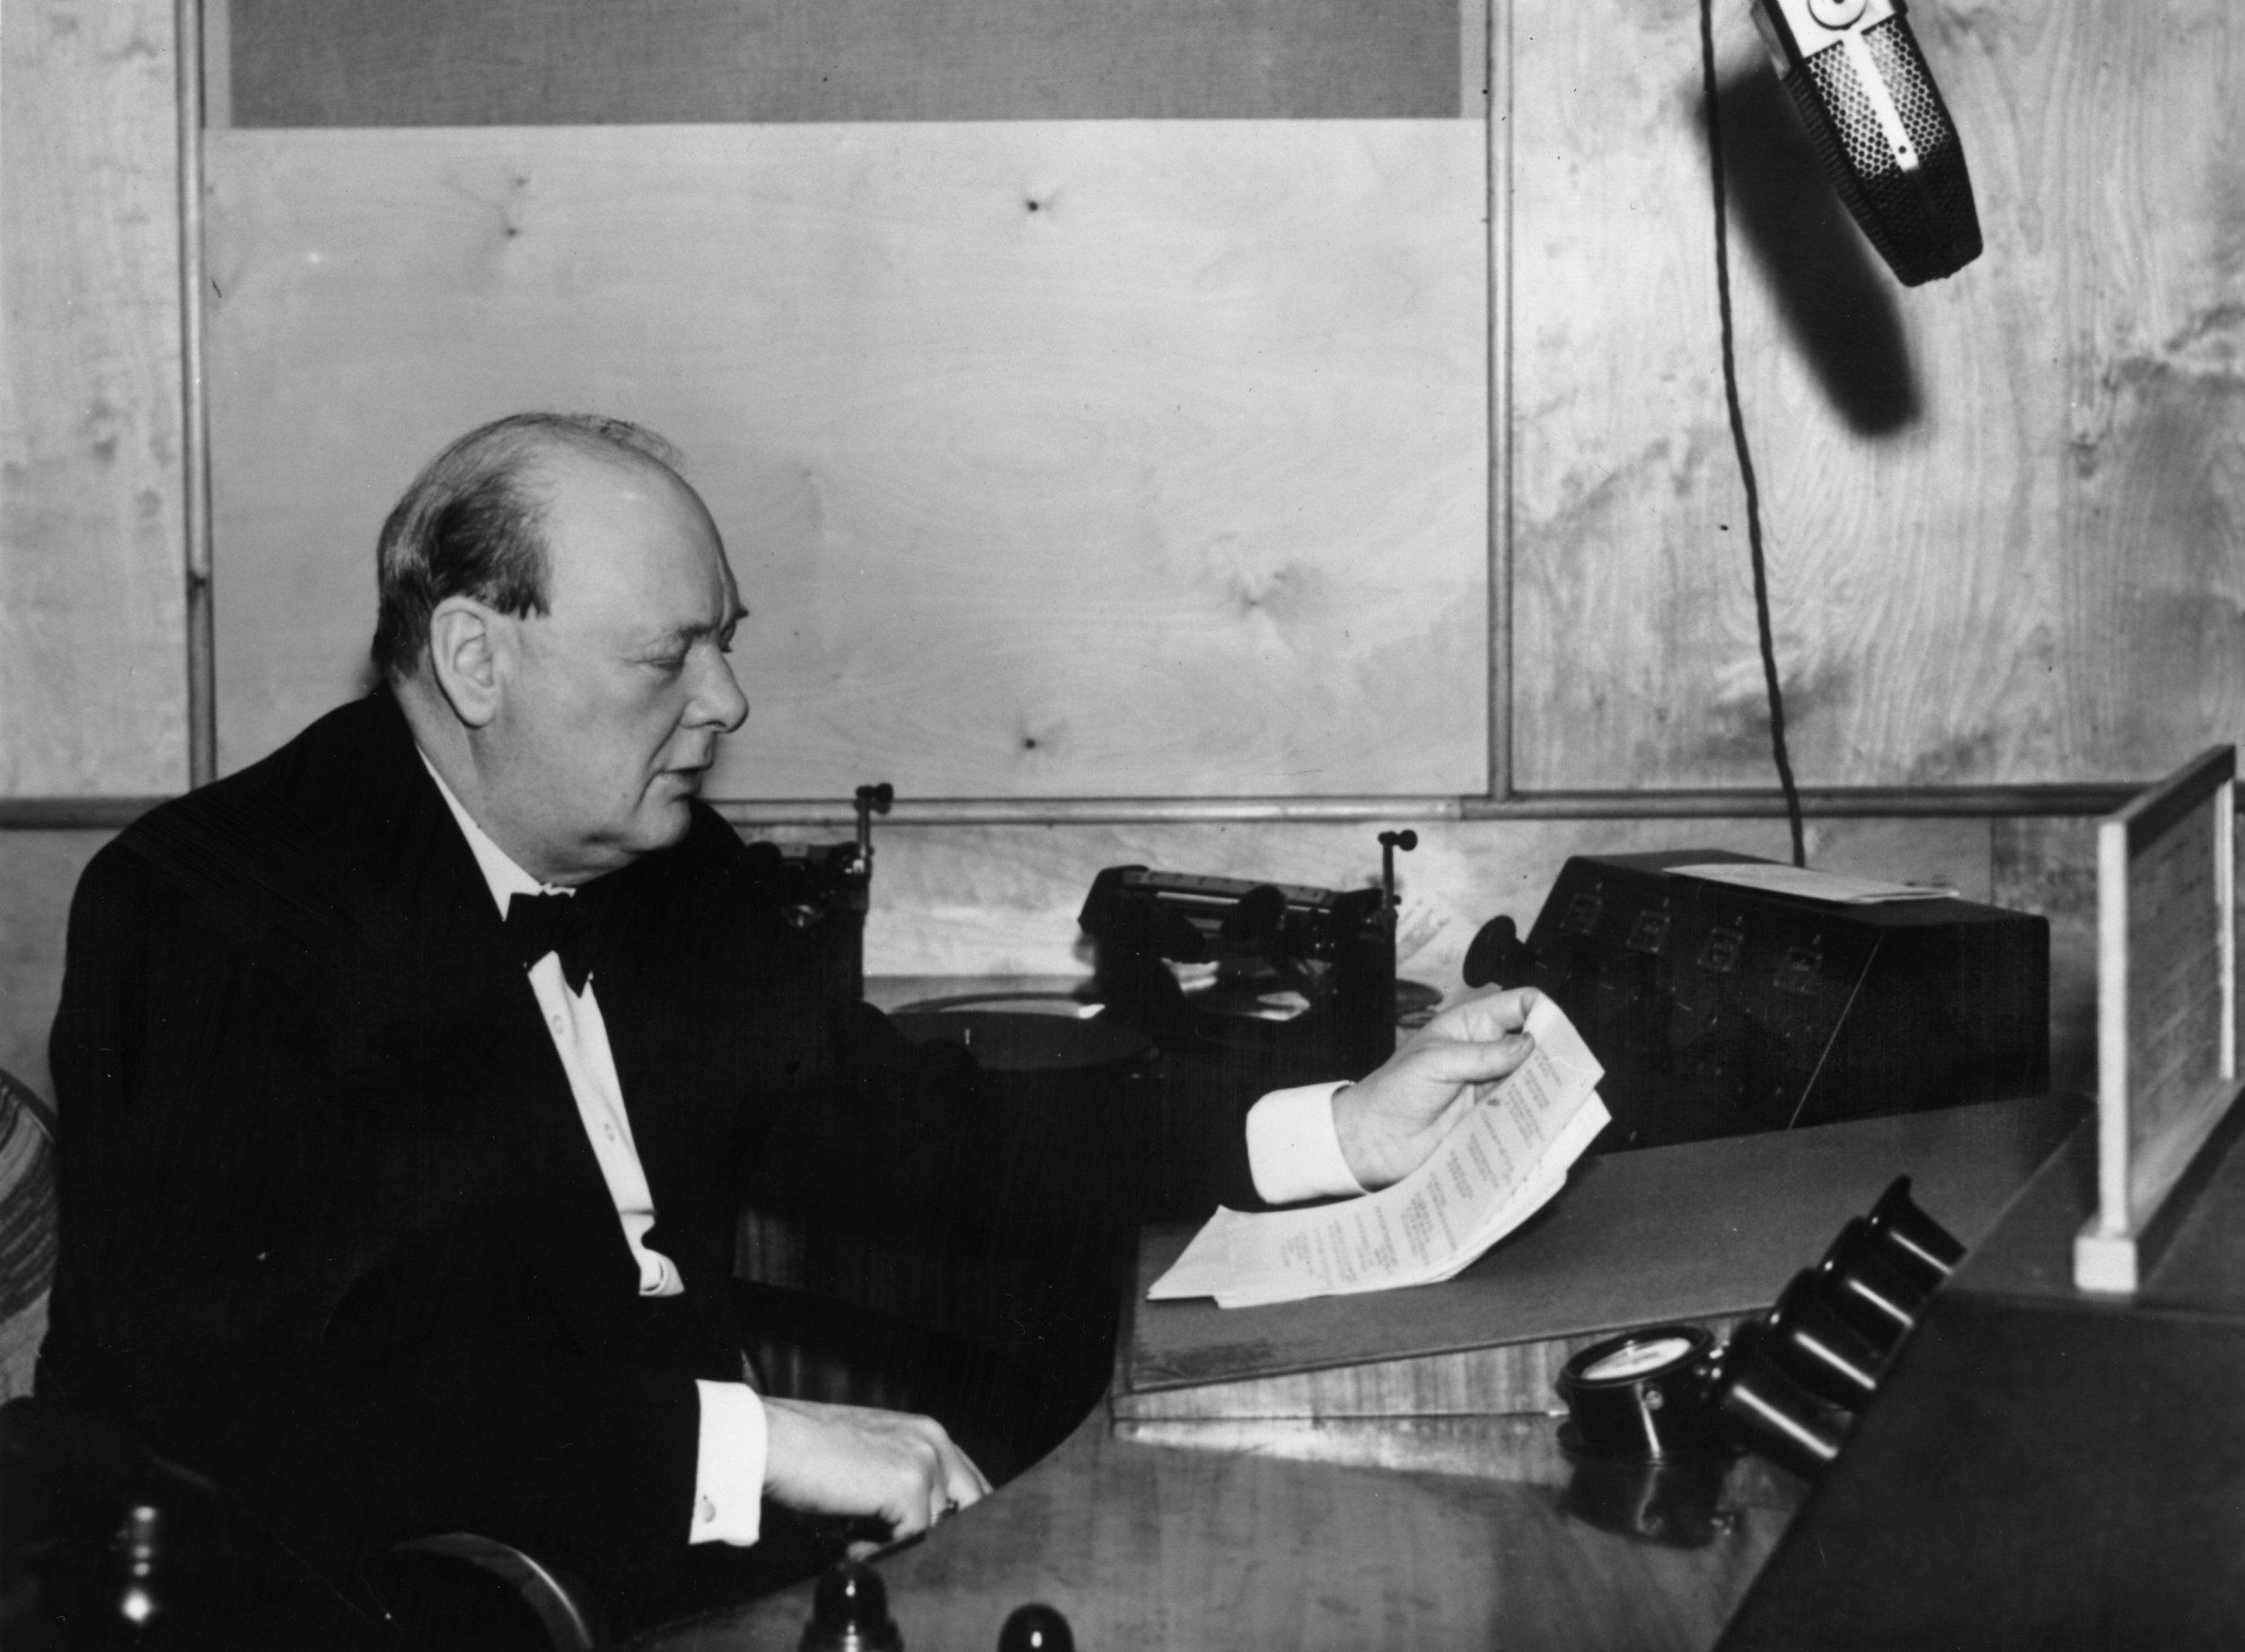 2-17-17 Winston Churchill